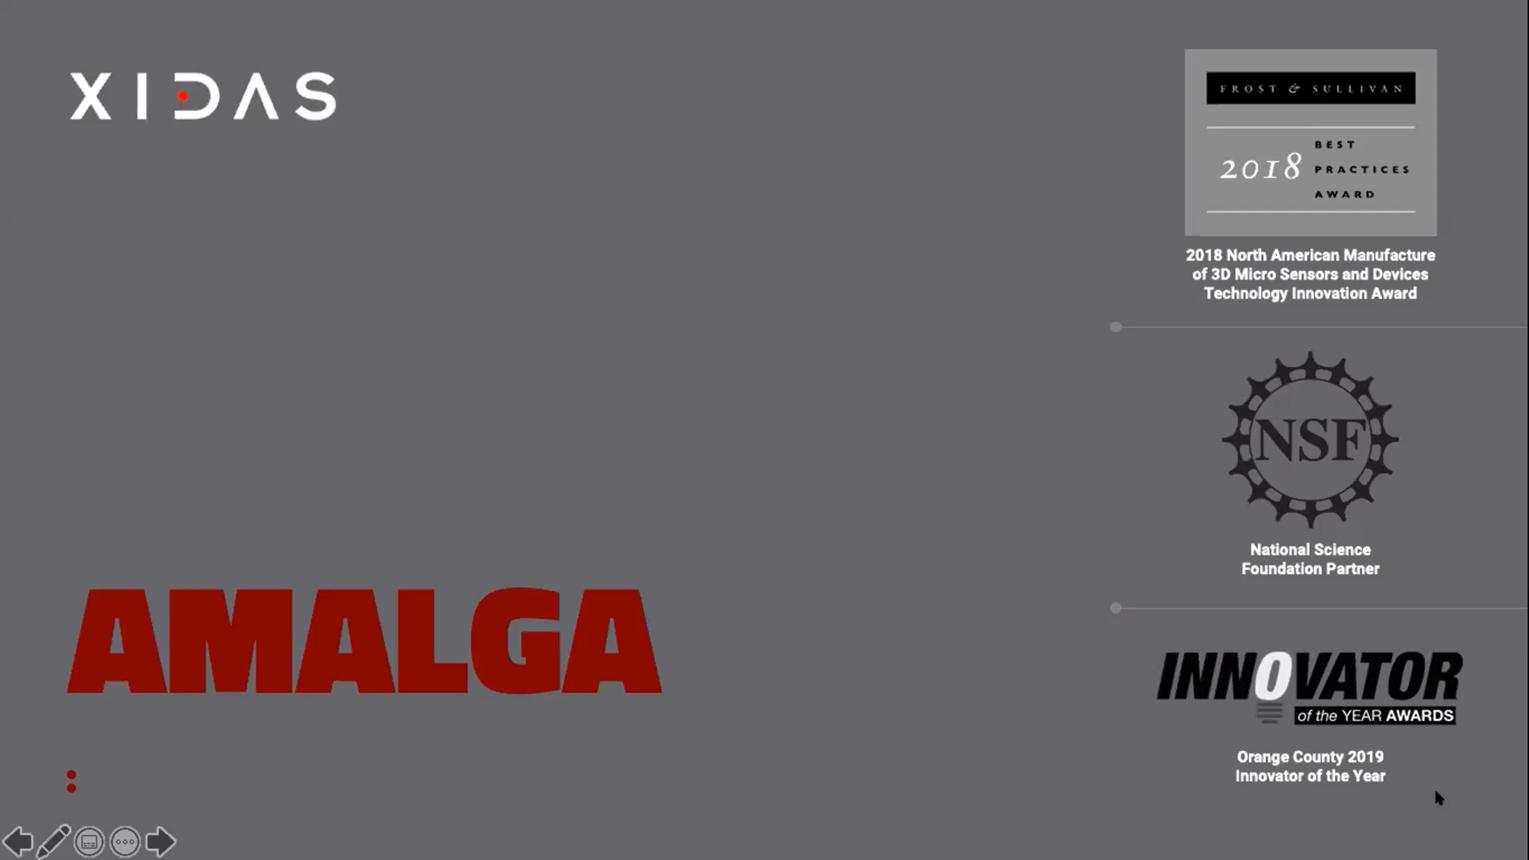 Amalga: Alternative to MEMS Technology for Miniature RF Components